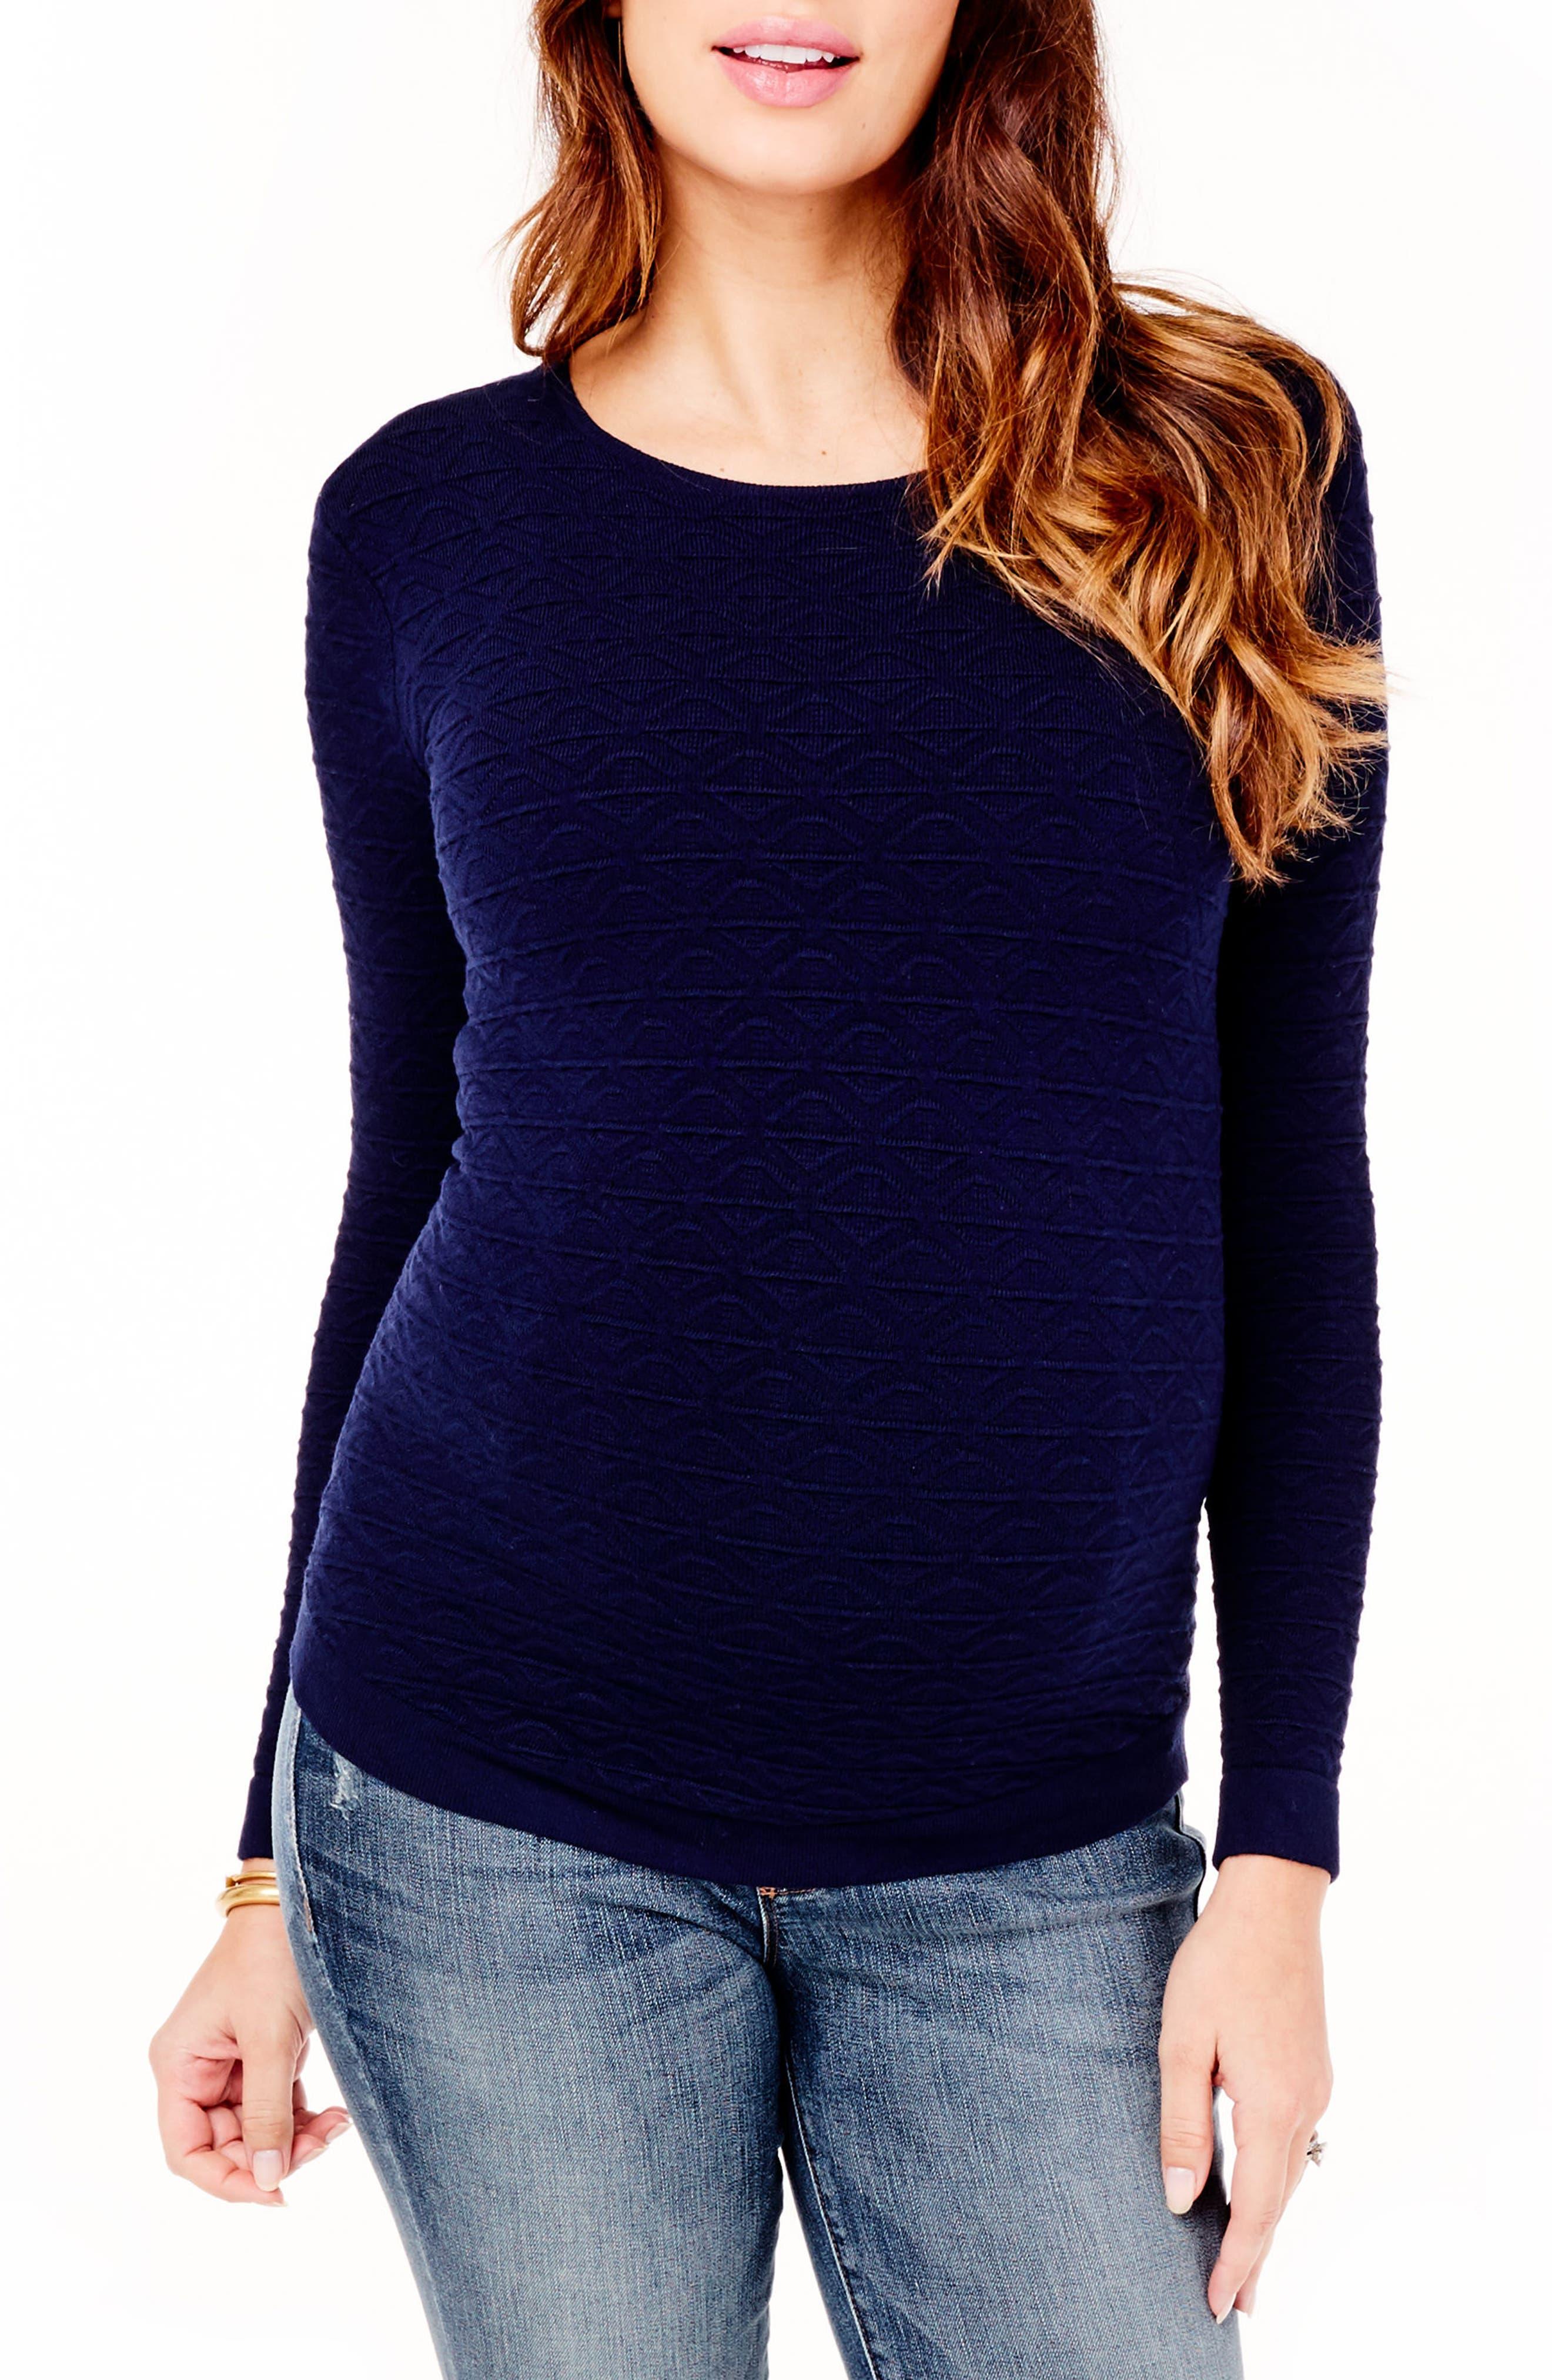 Ingrid & Isabel Textured Knit Maternity Sweater